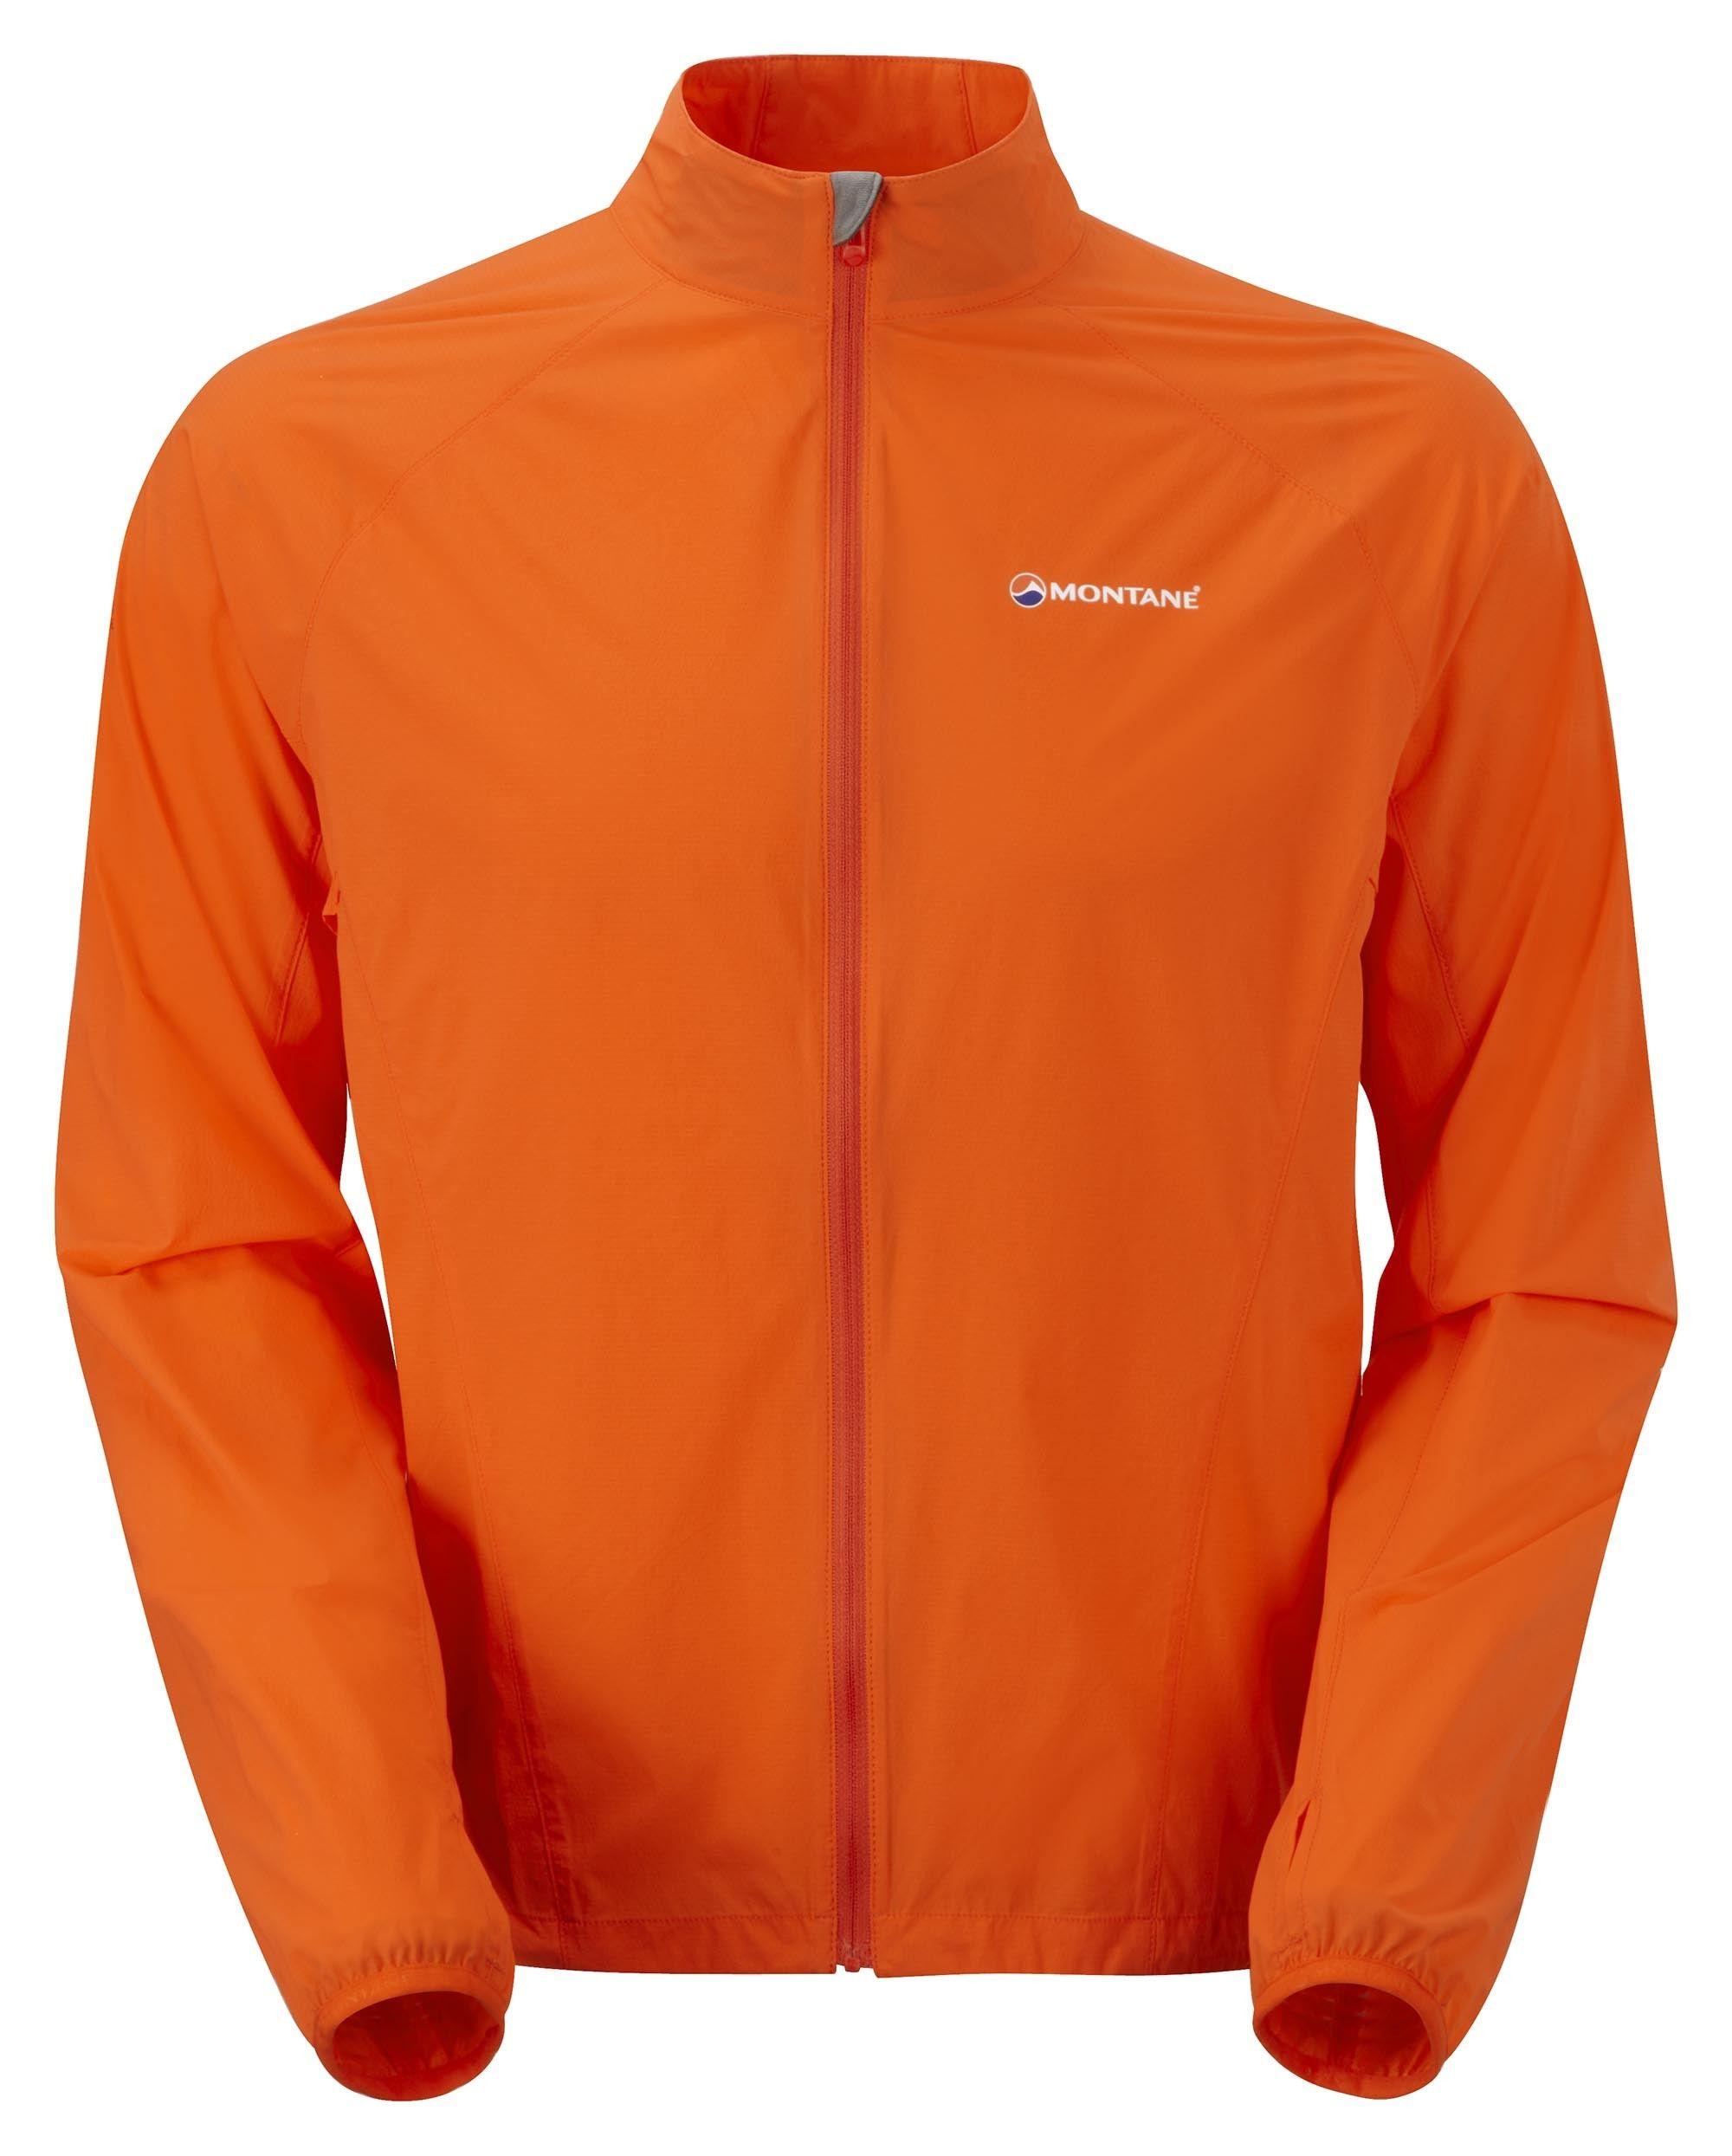 Montane Featherlite Trail Jacket Running jacket, Jackets